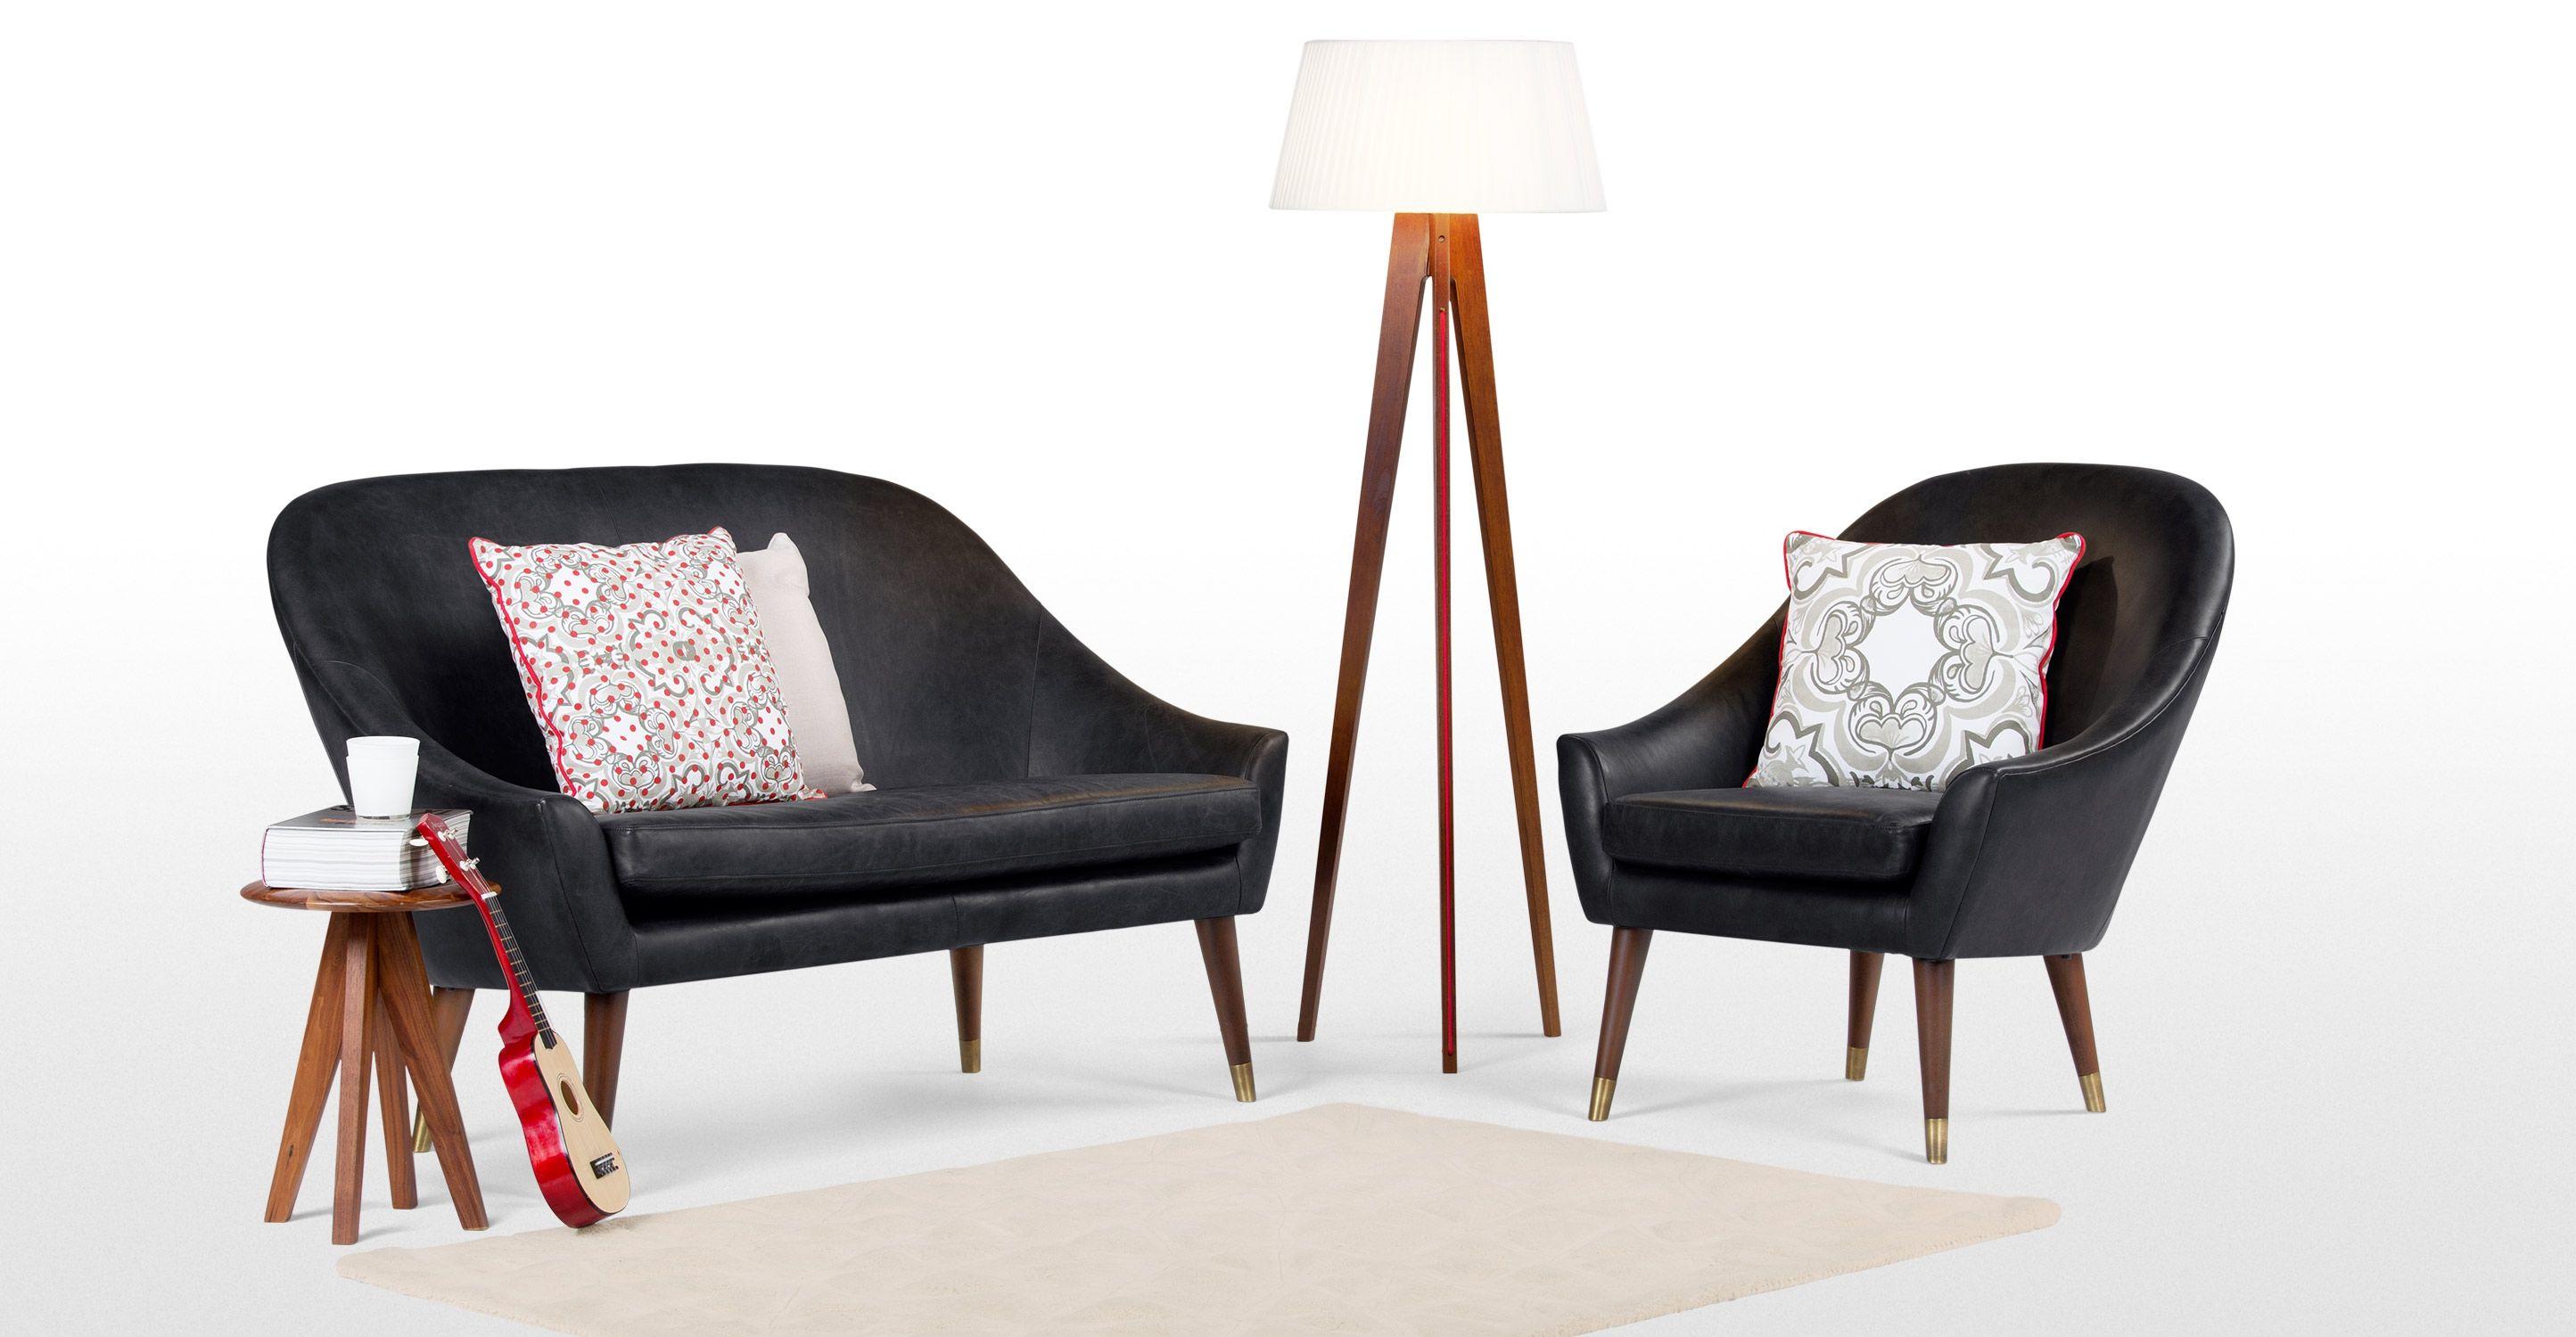 Seattle 2 Sitzer Sofa Oxford Schwarz Premium Leder Made Com 2 Sitzer Sofa Sessel Sofa